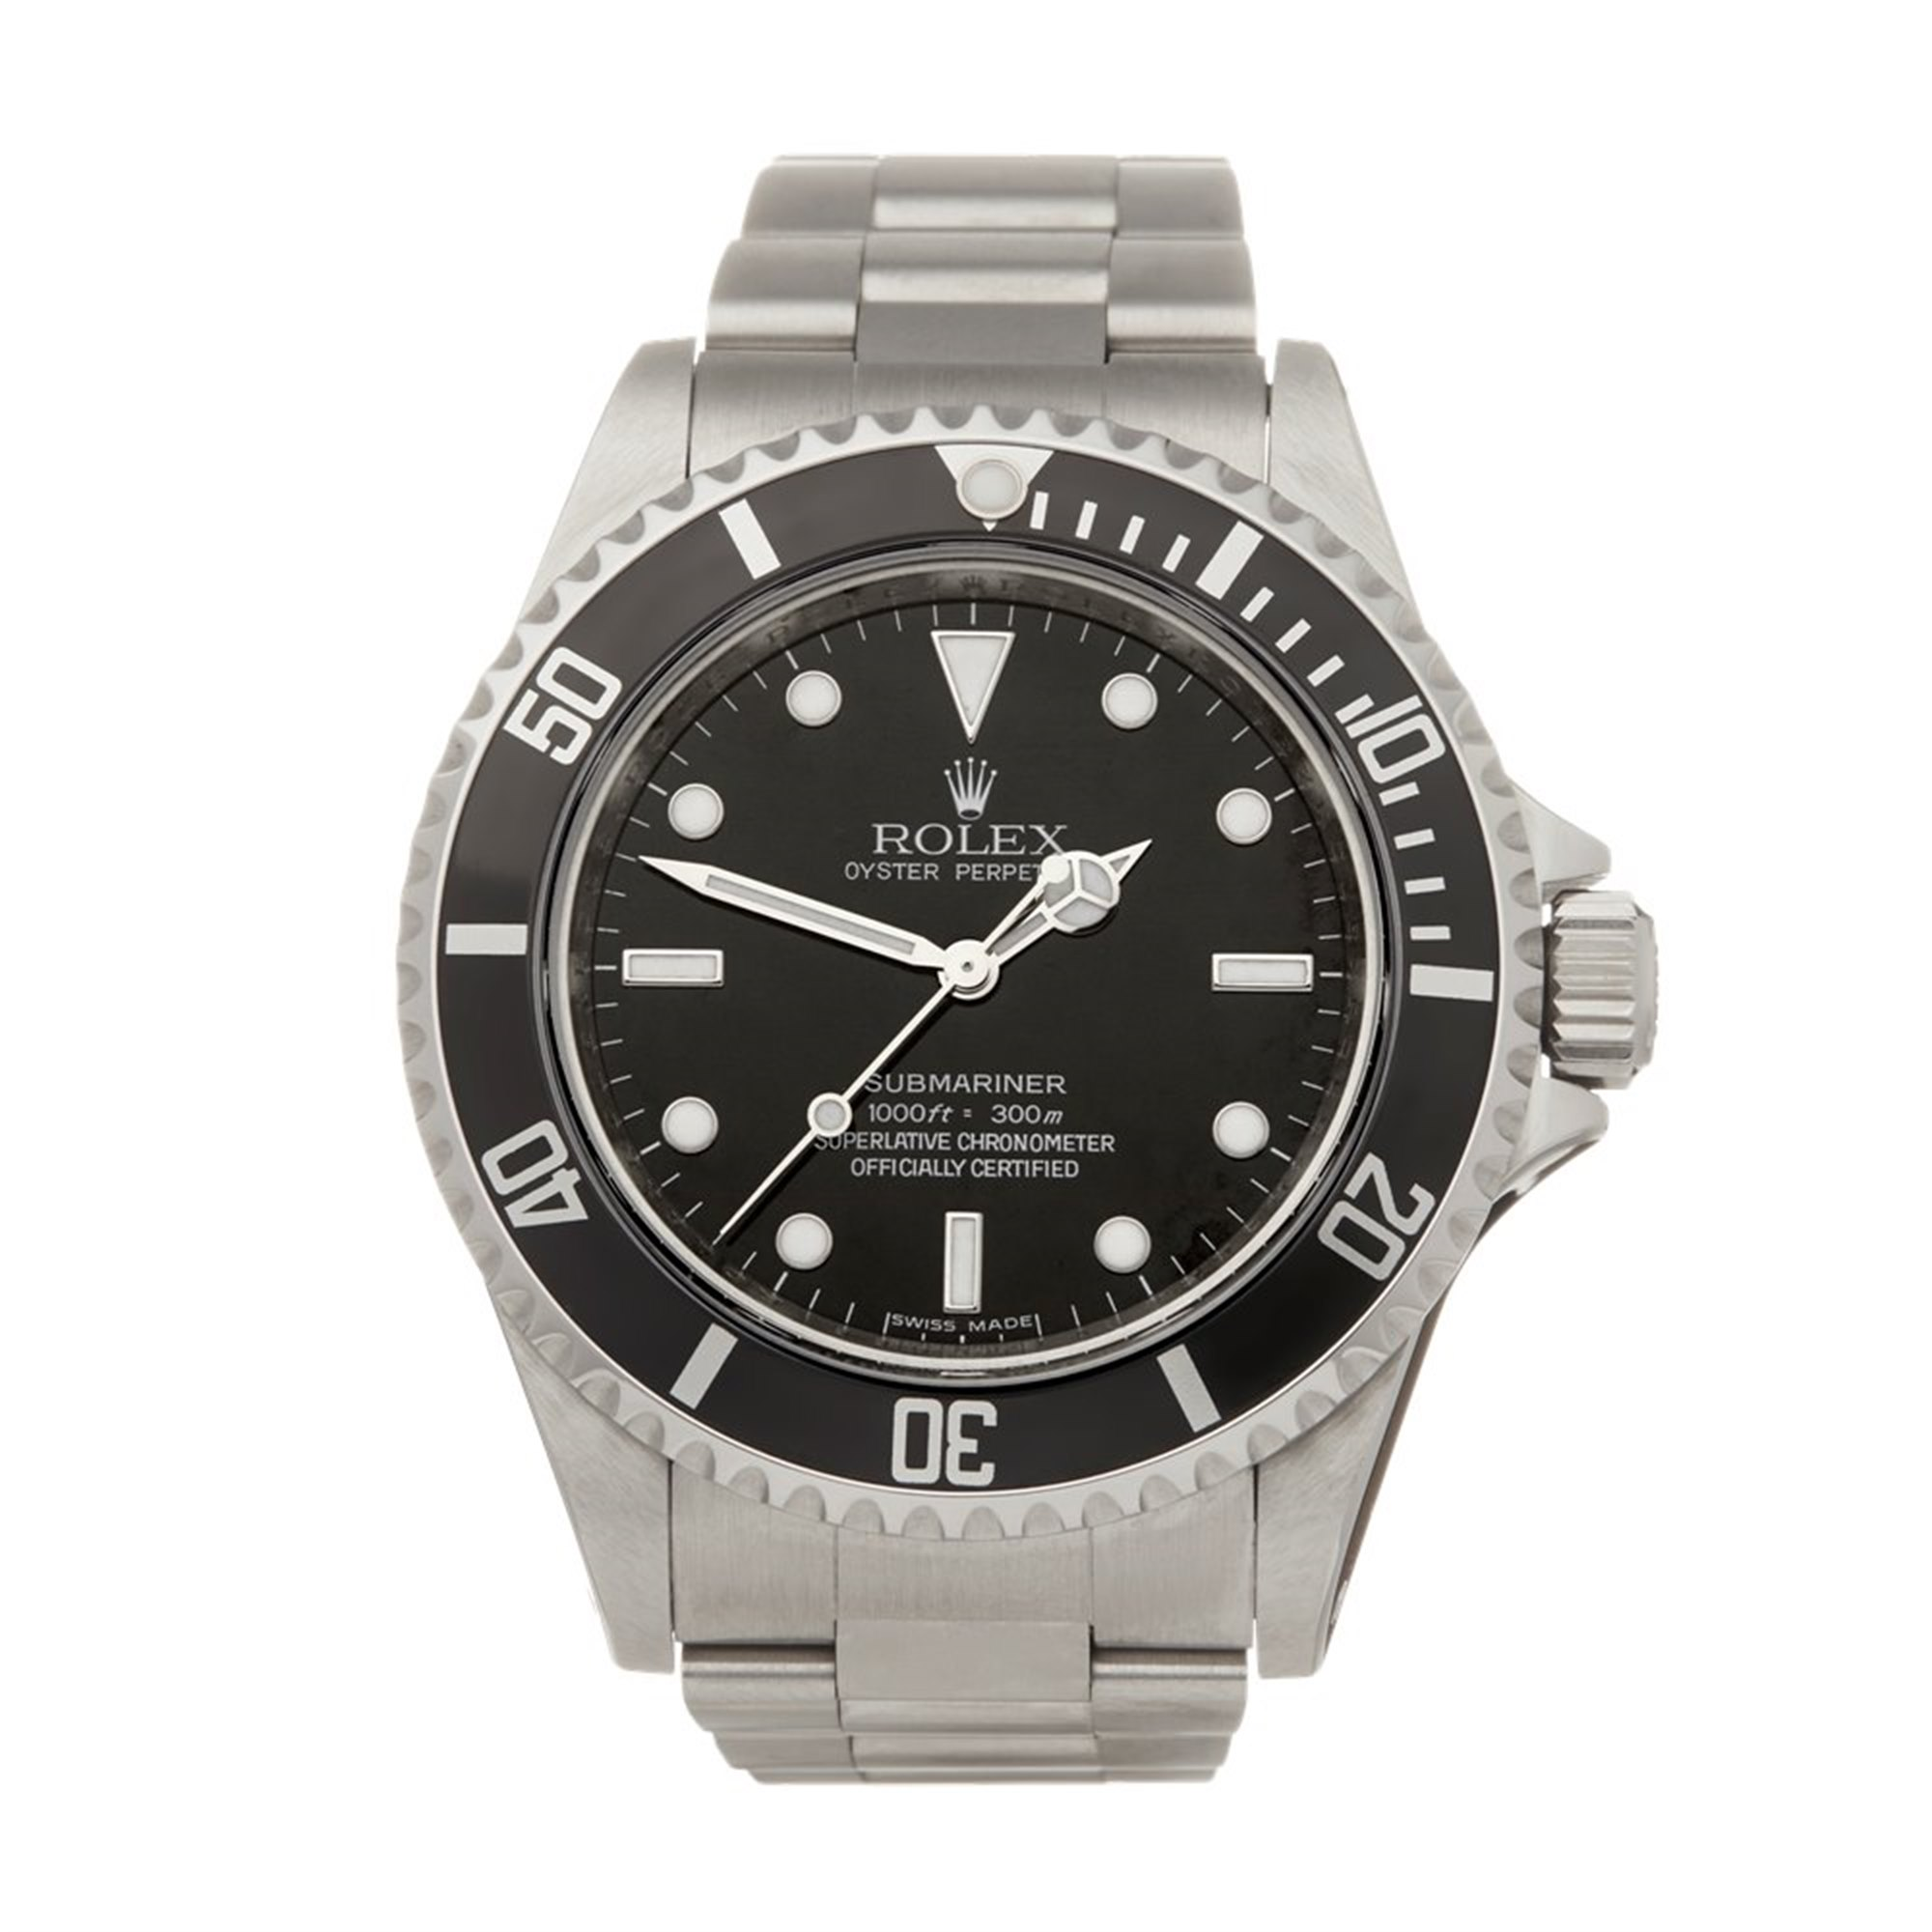 Rolex Submariner No Date Stainless Steel 14060